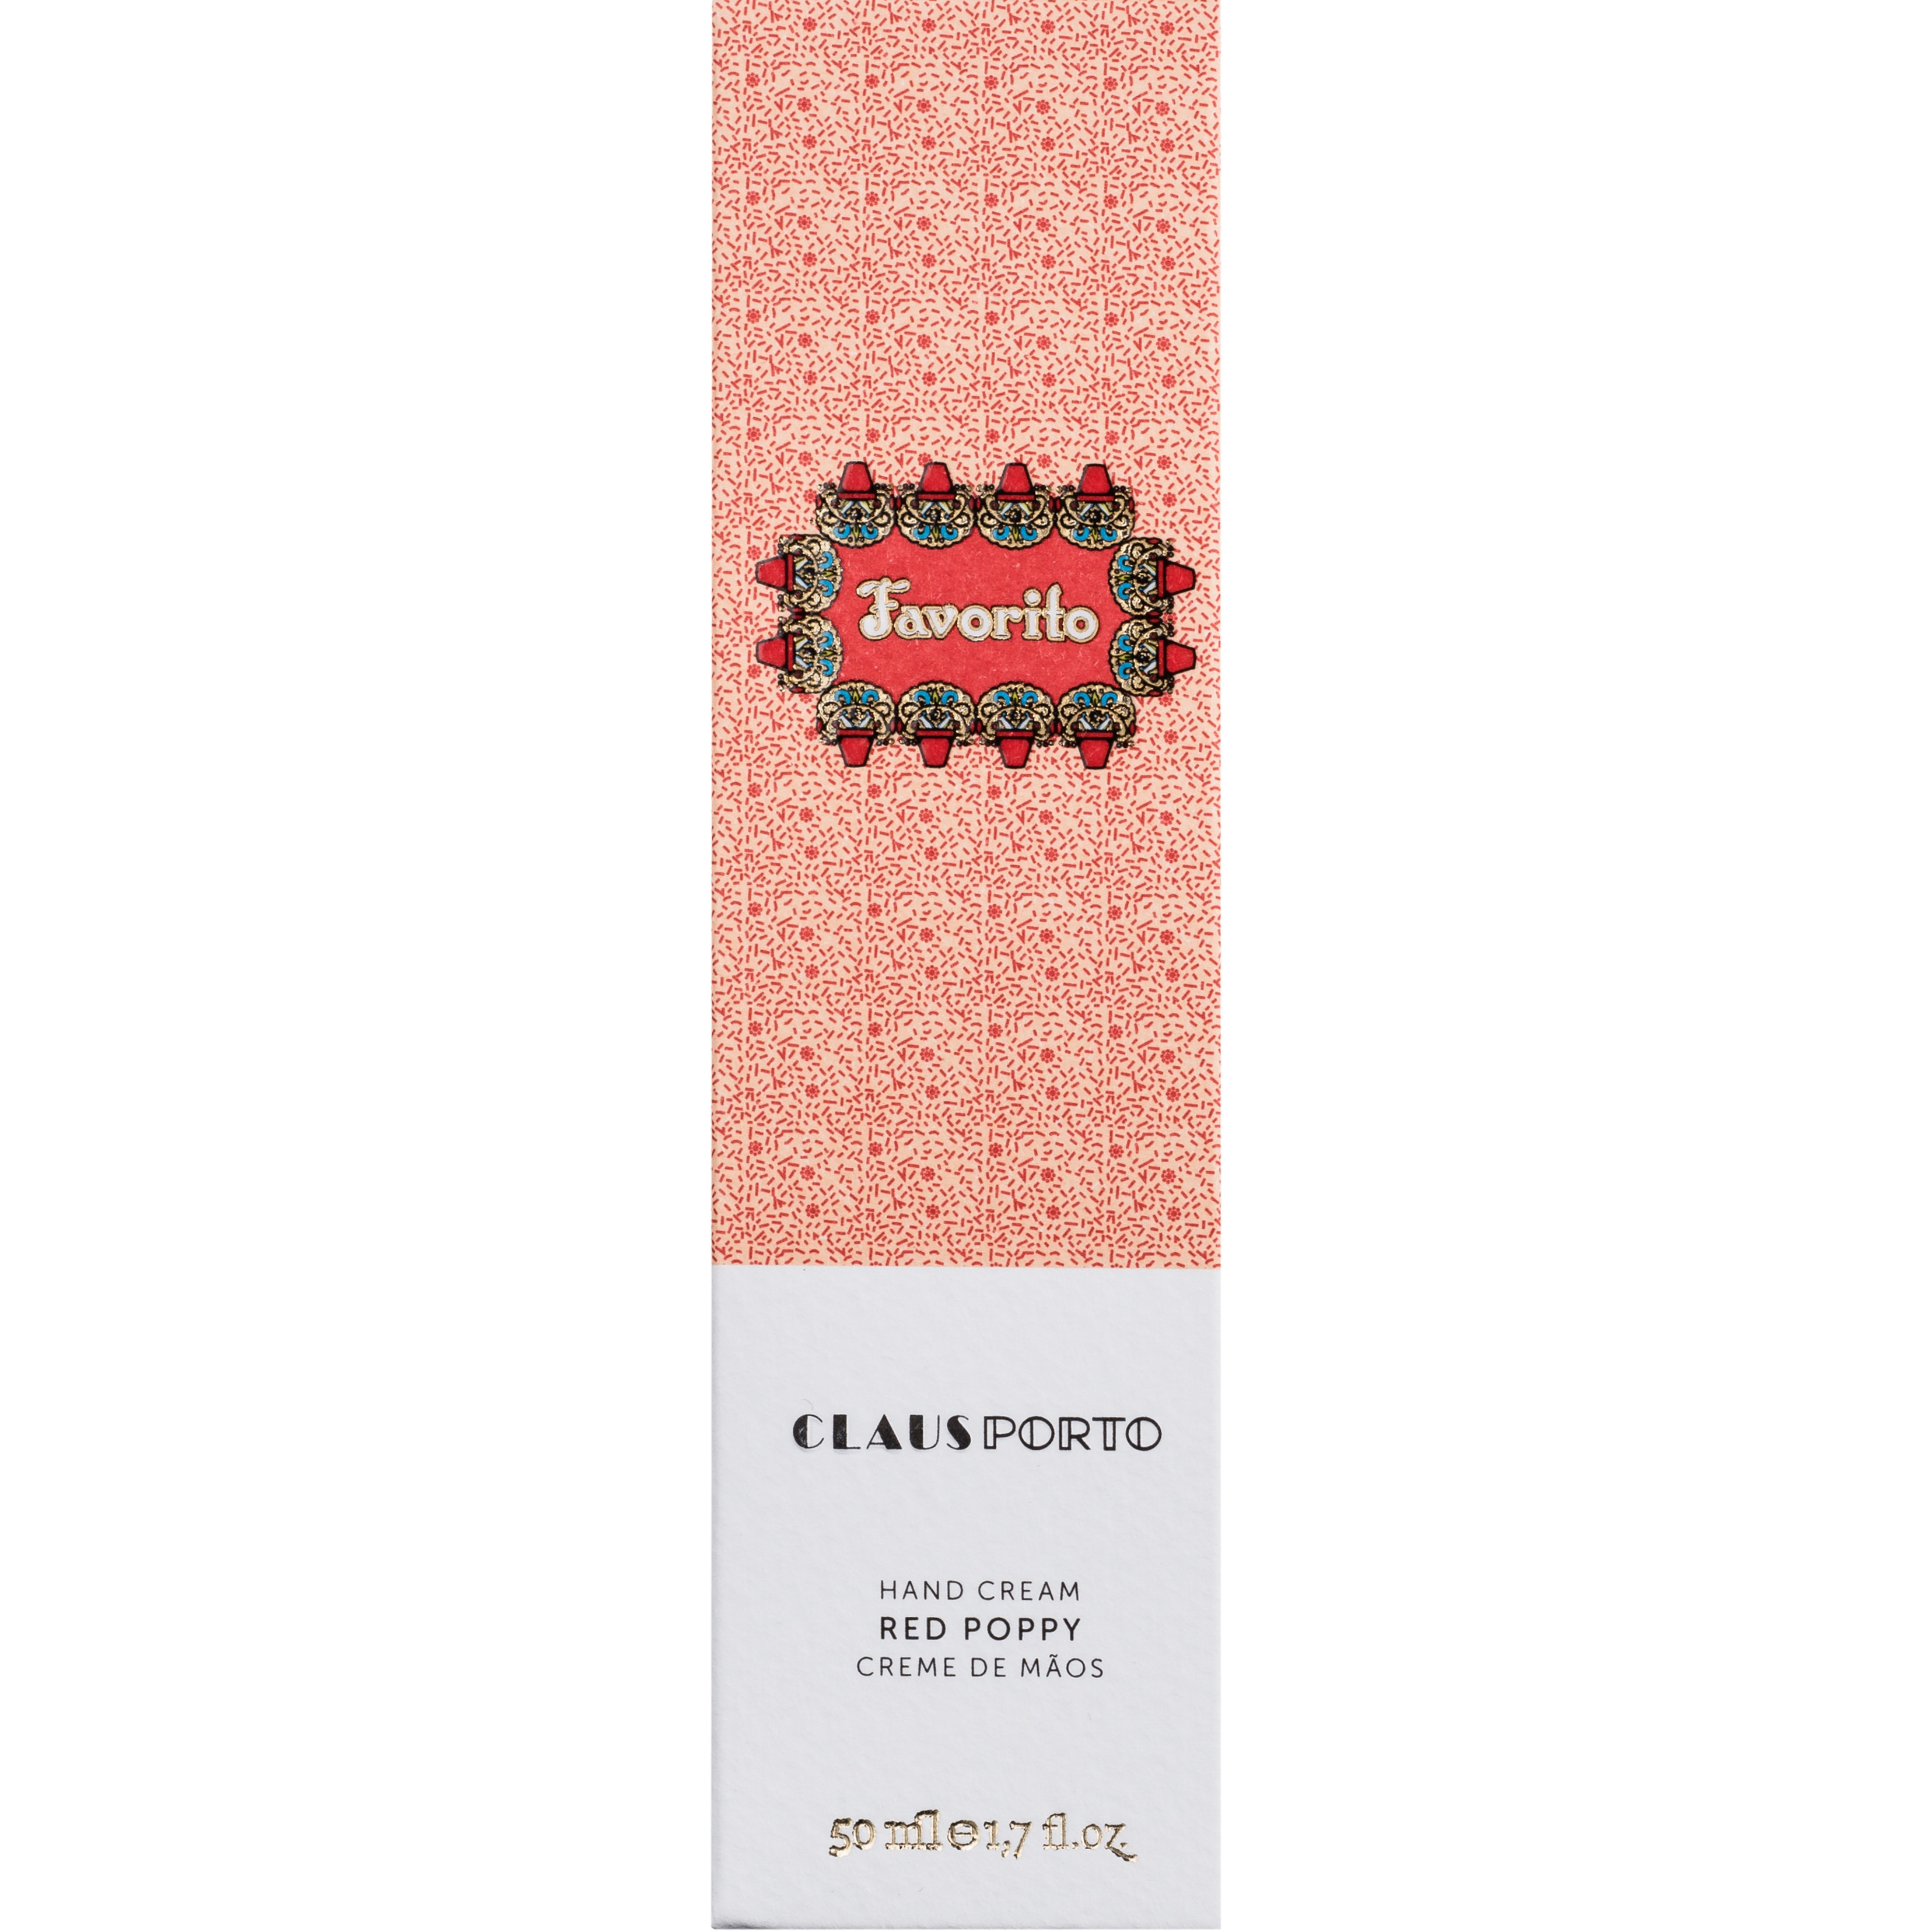 Handcrème - Favorito / Red Poppy